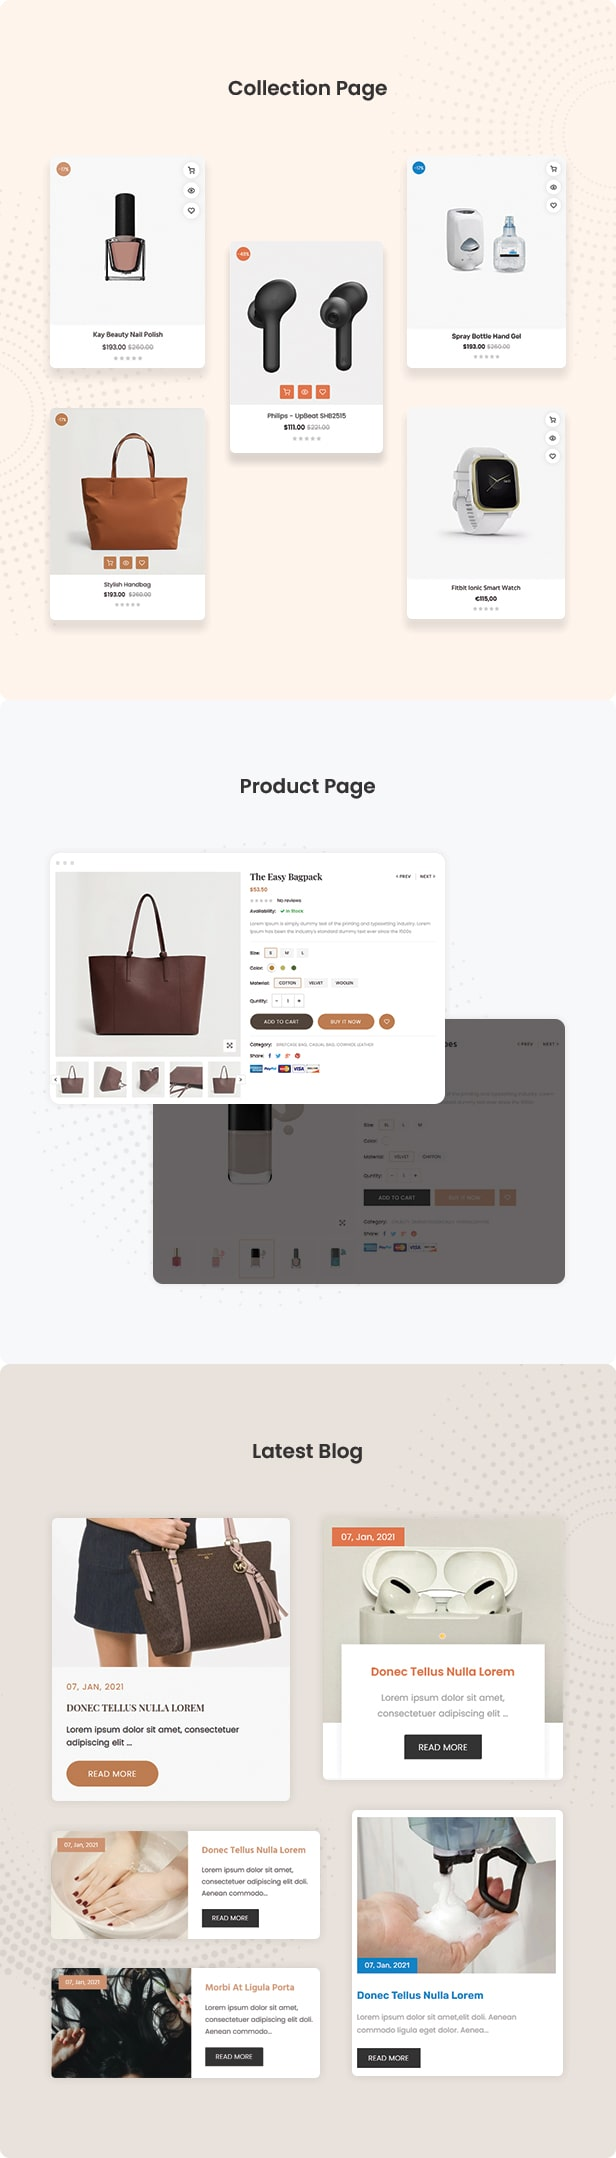 Votto - The Single product Multipurpose Shopify Theme - 3